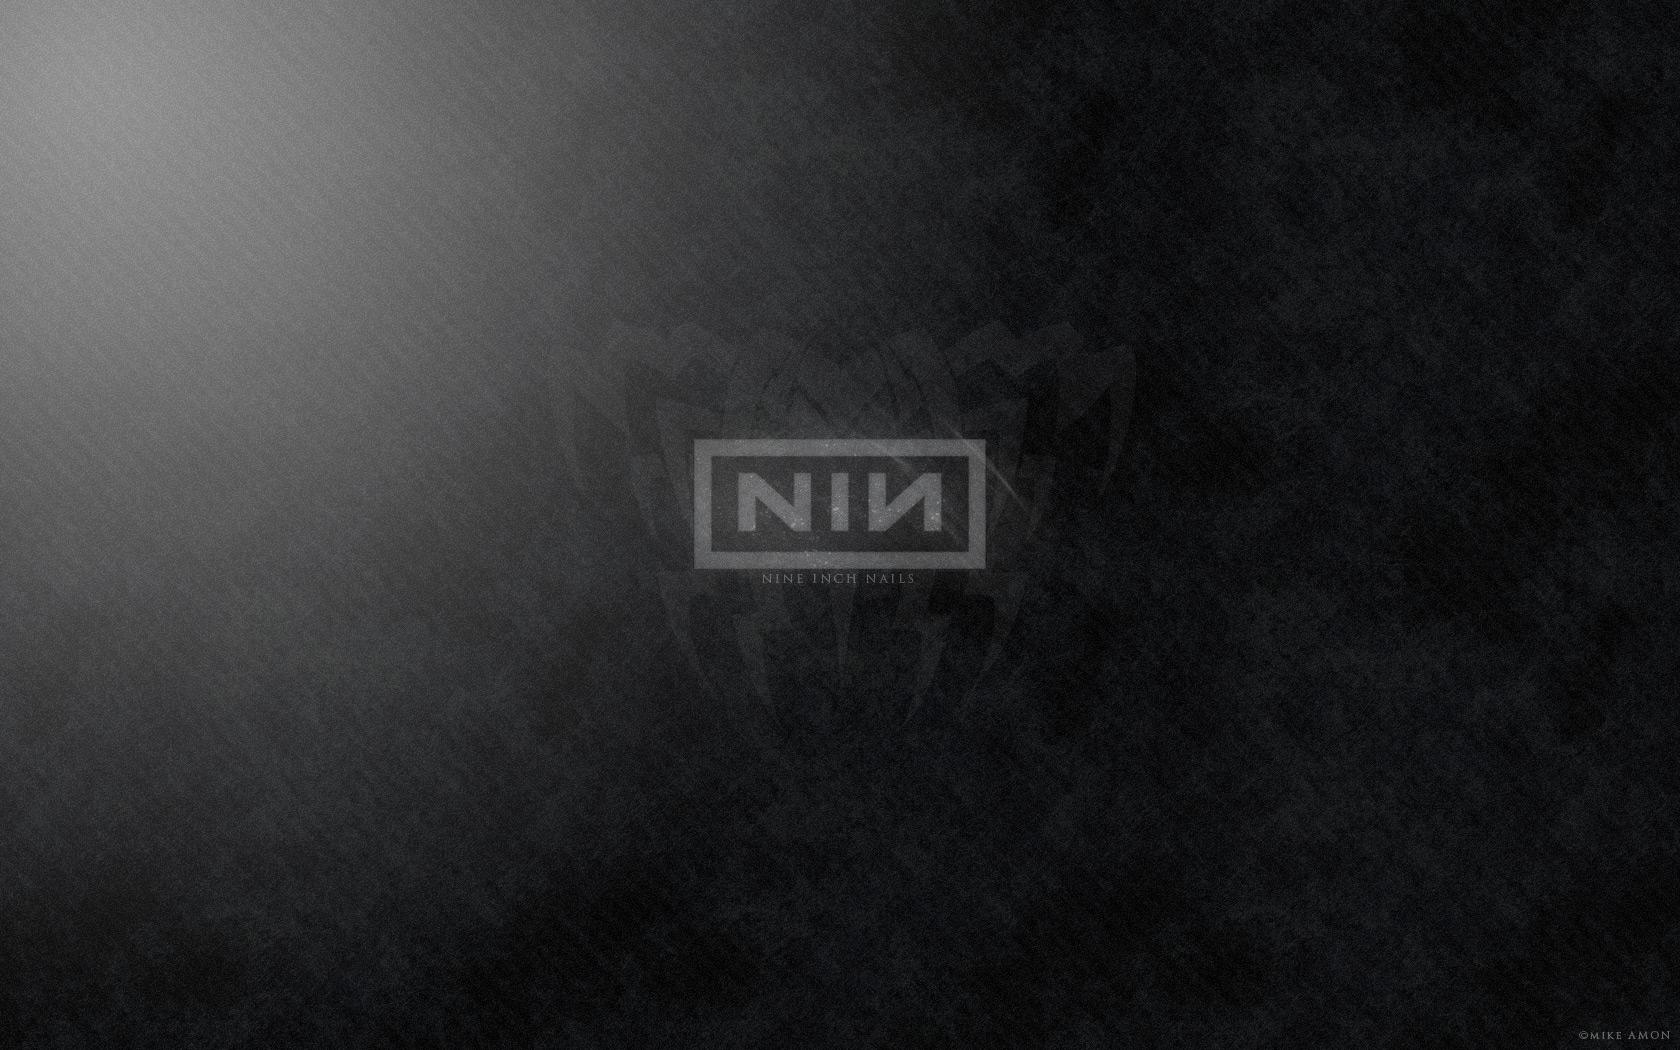 NiN - Nine Inch Nails Wallpape by gunkl on DeviantArt